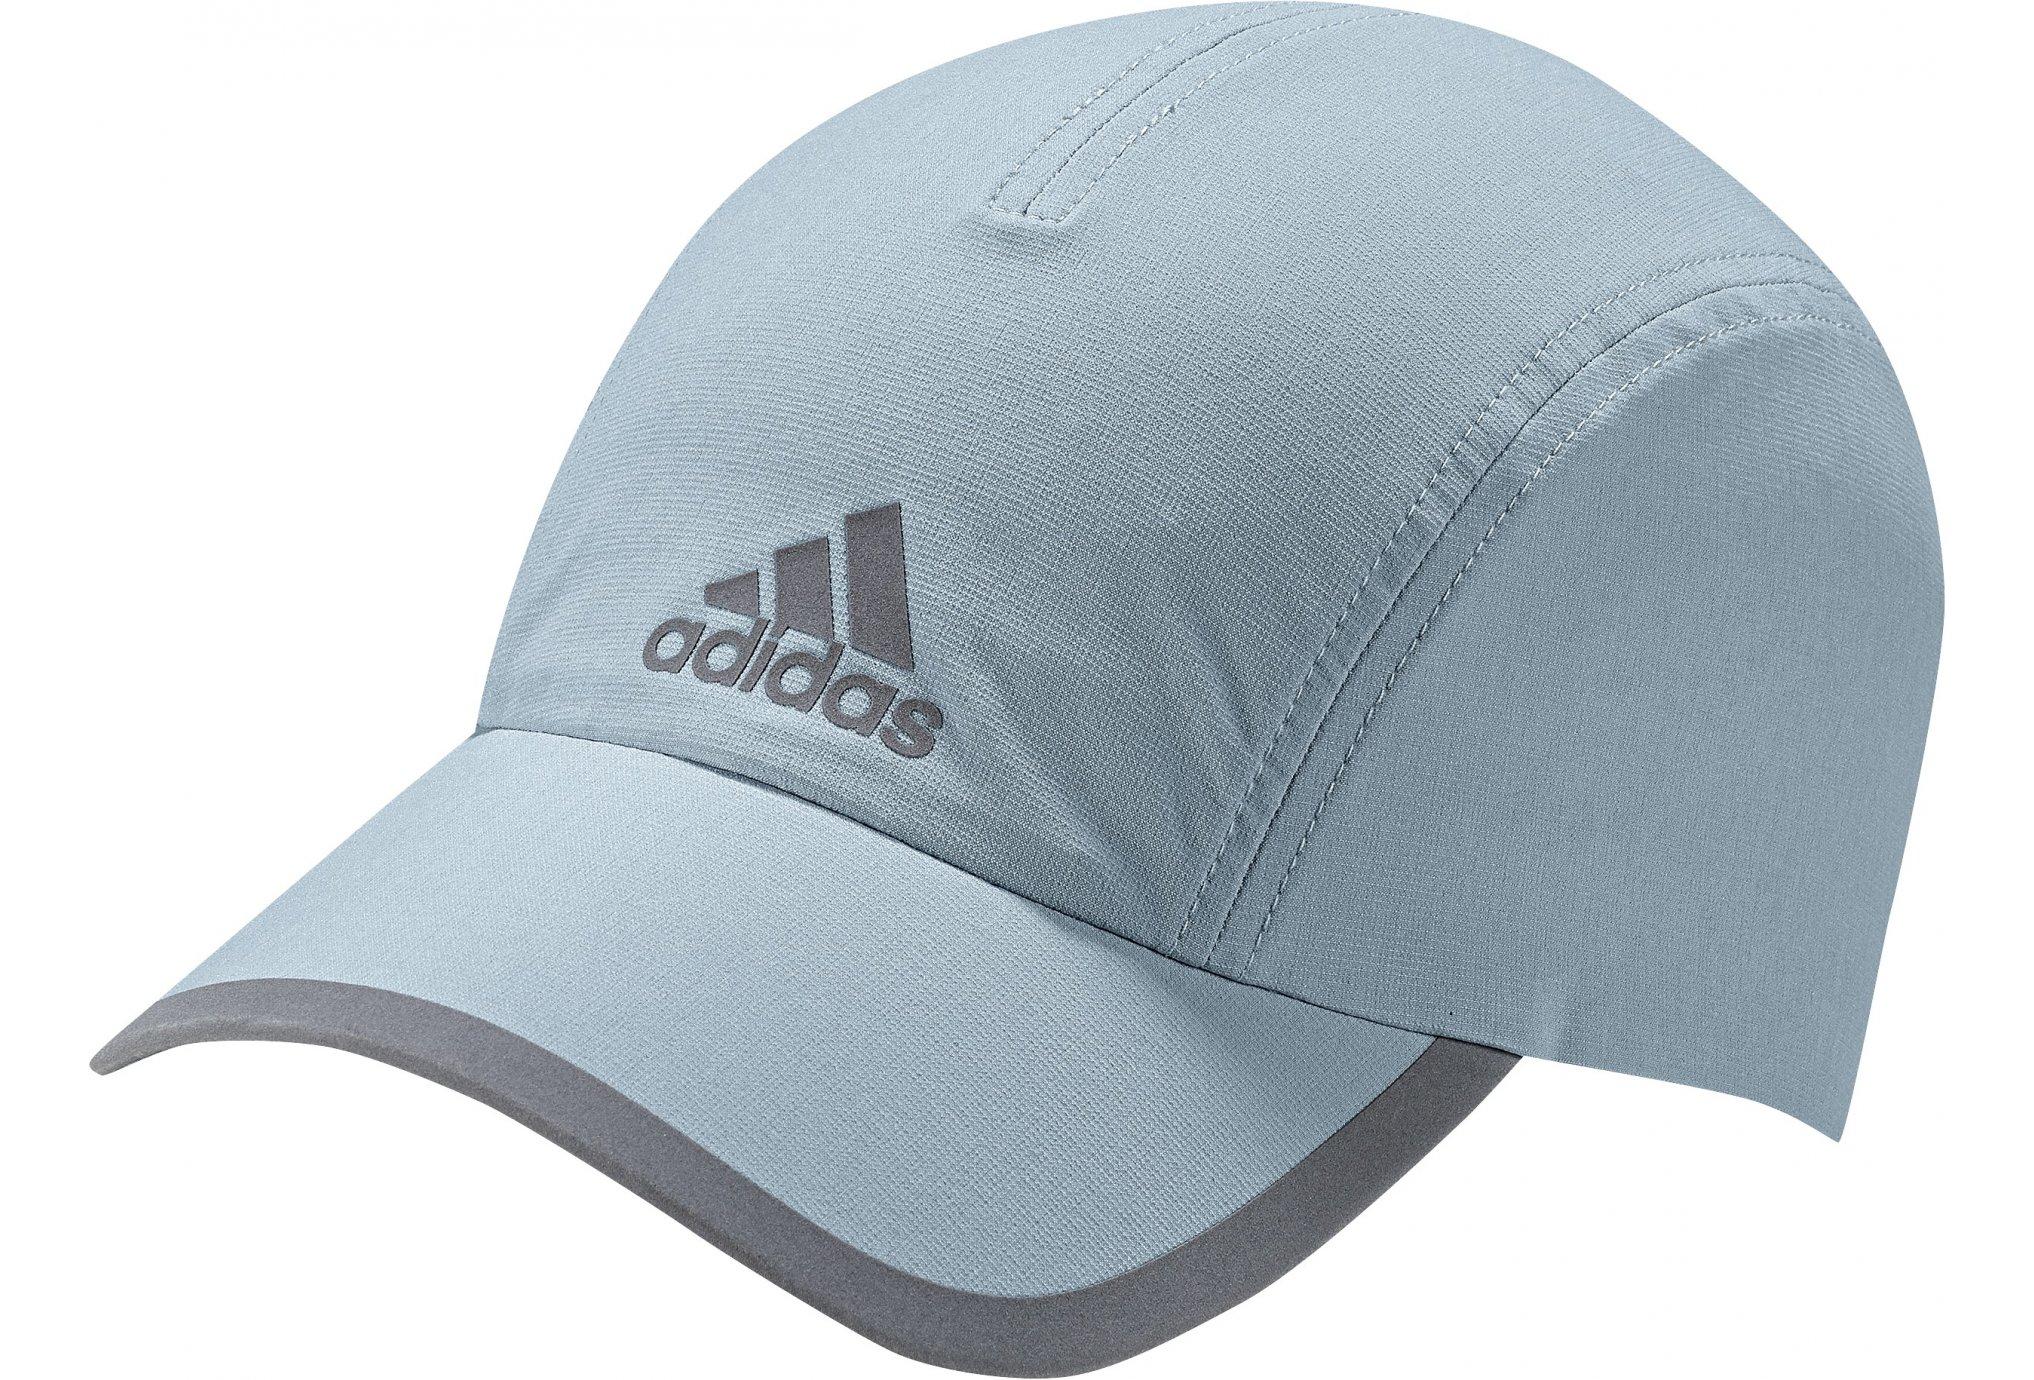 Adidas Climalite w casquettes / bandeaux